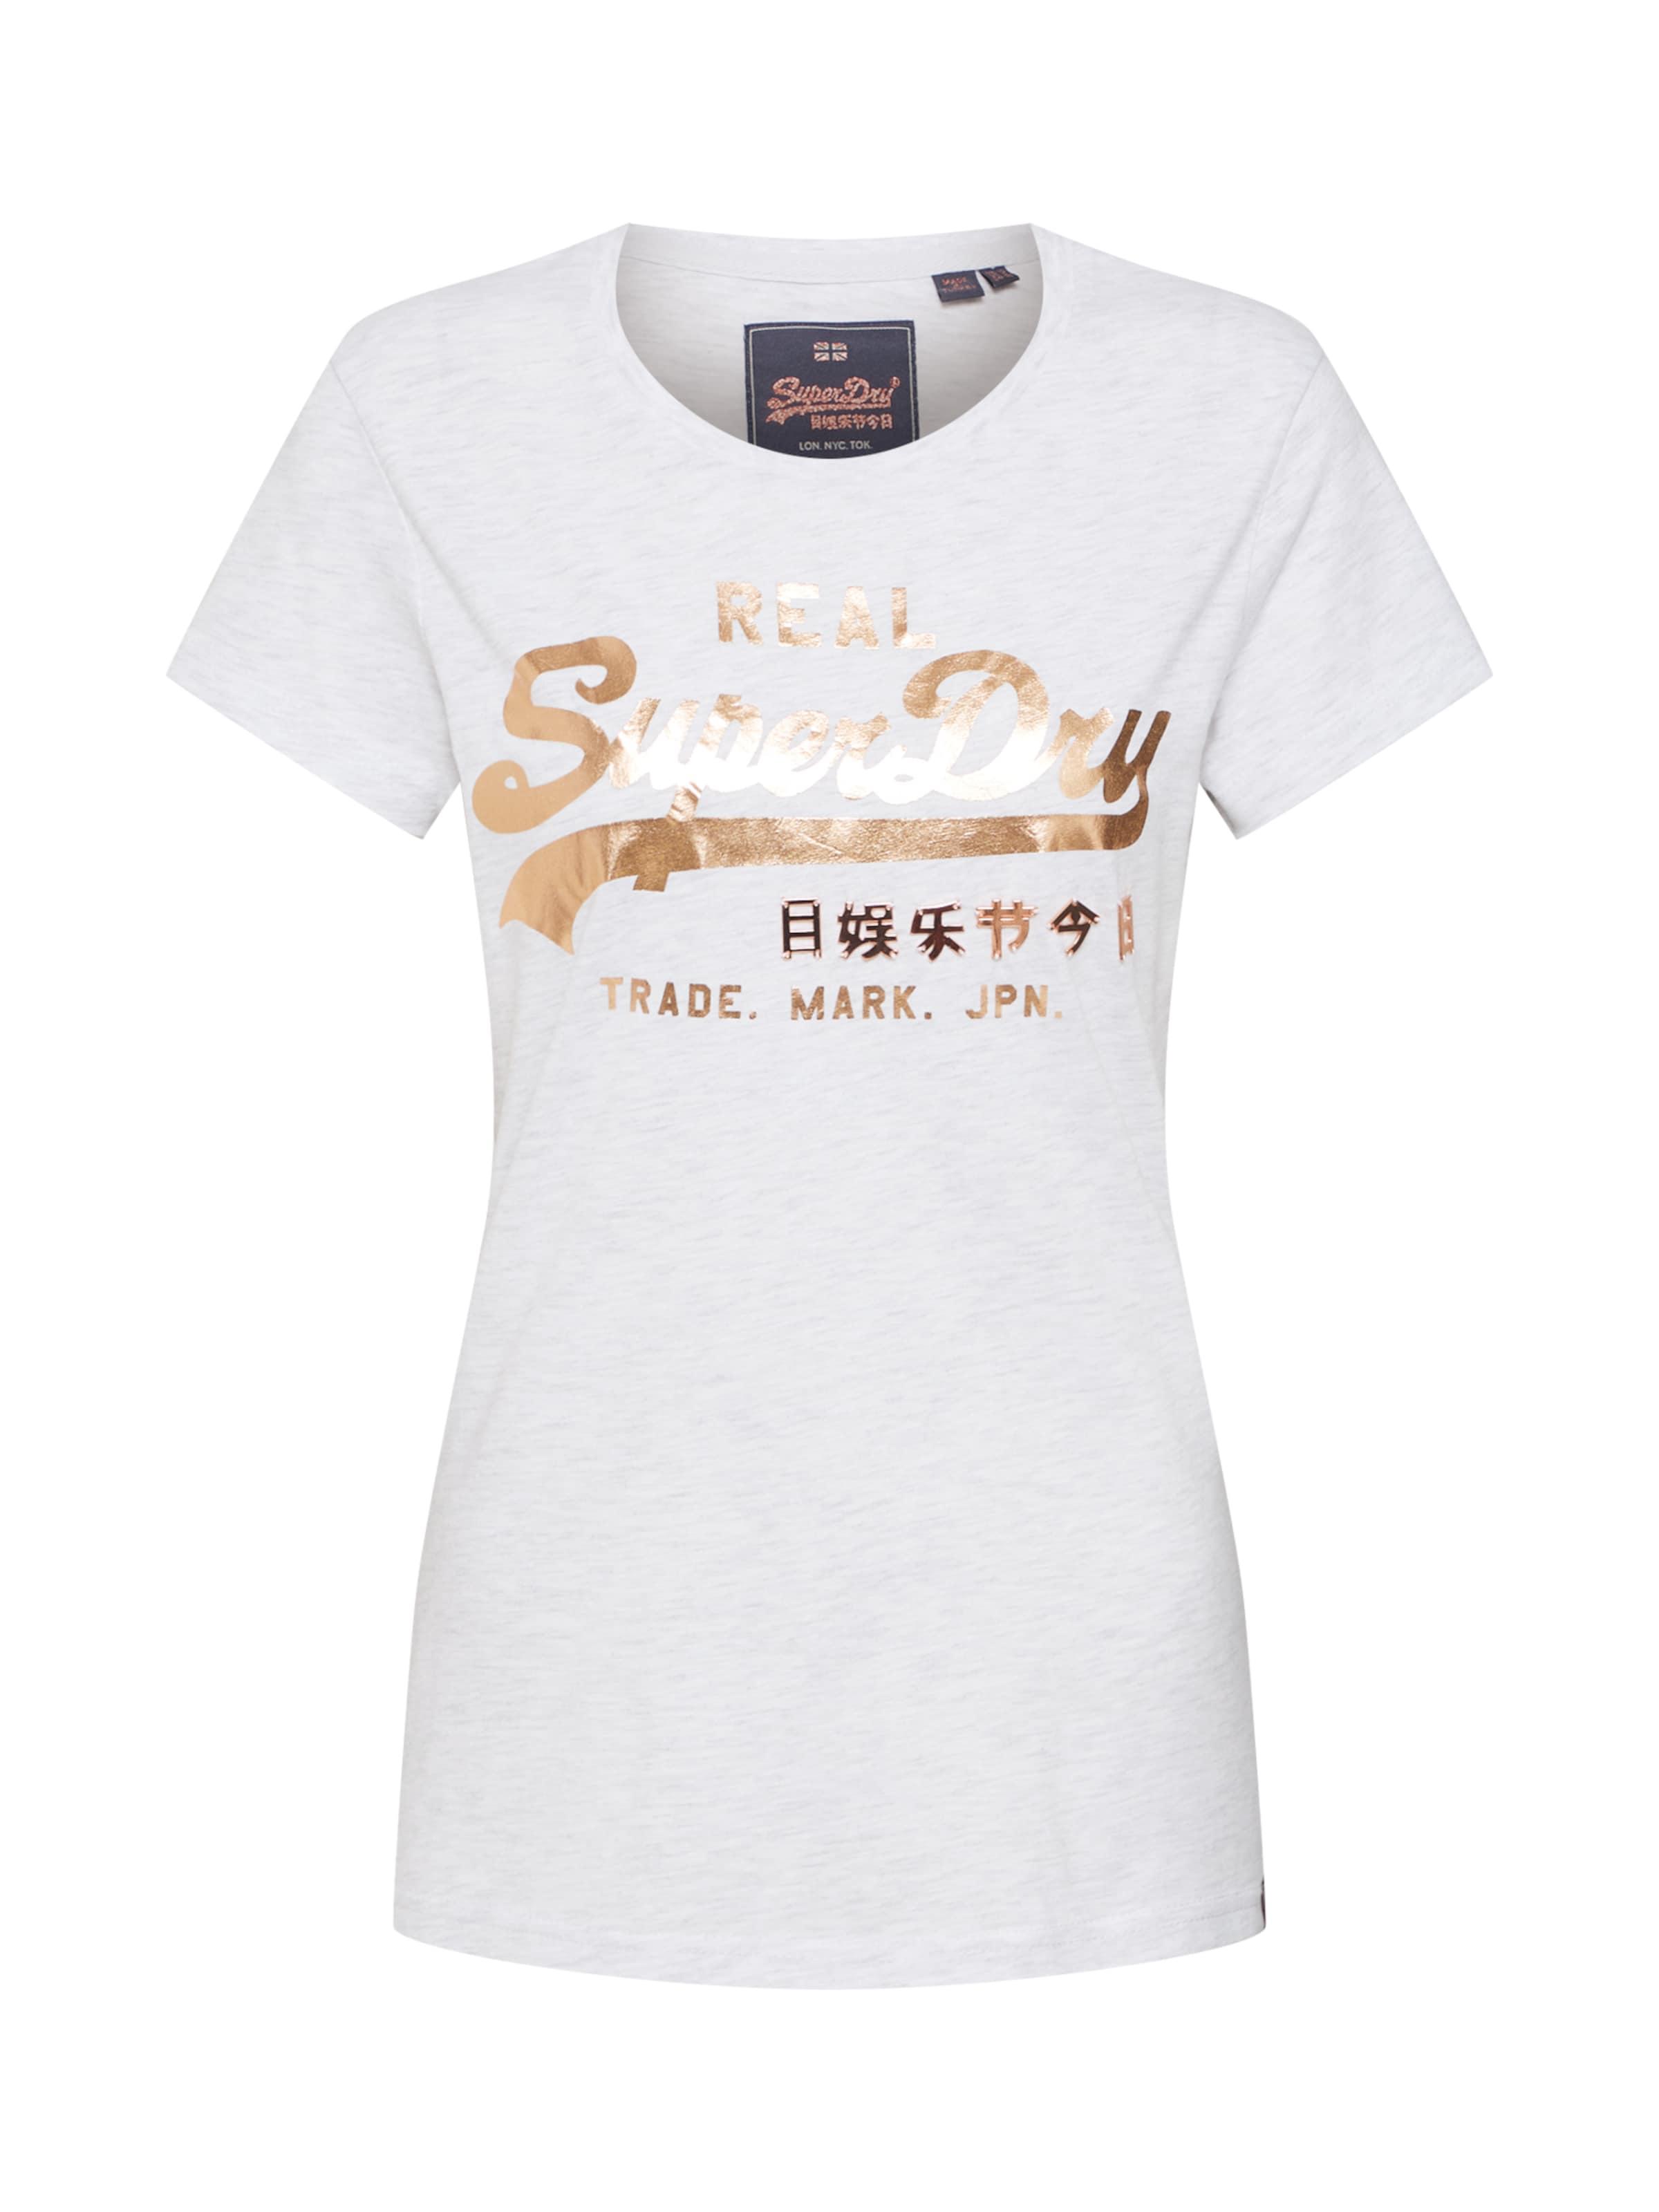 shirt GoldHellgrau In Metalwork' T Superdry Logo 'vintage eCBdoErxWQ